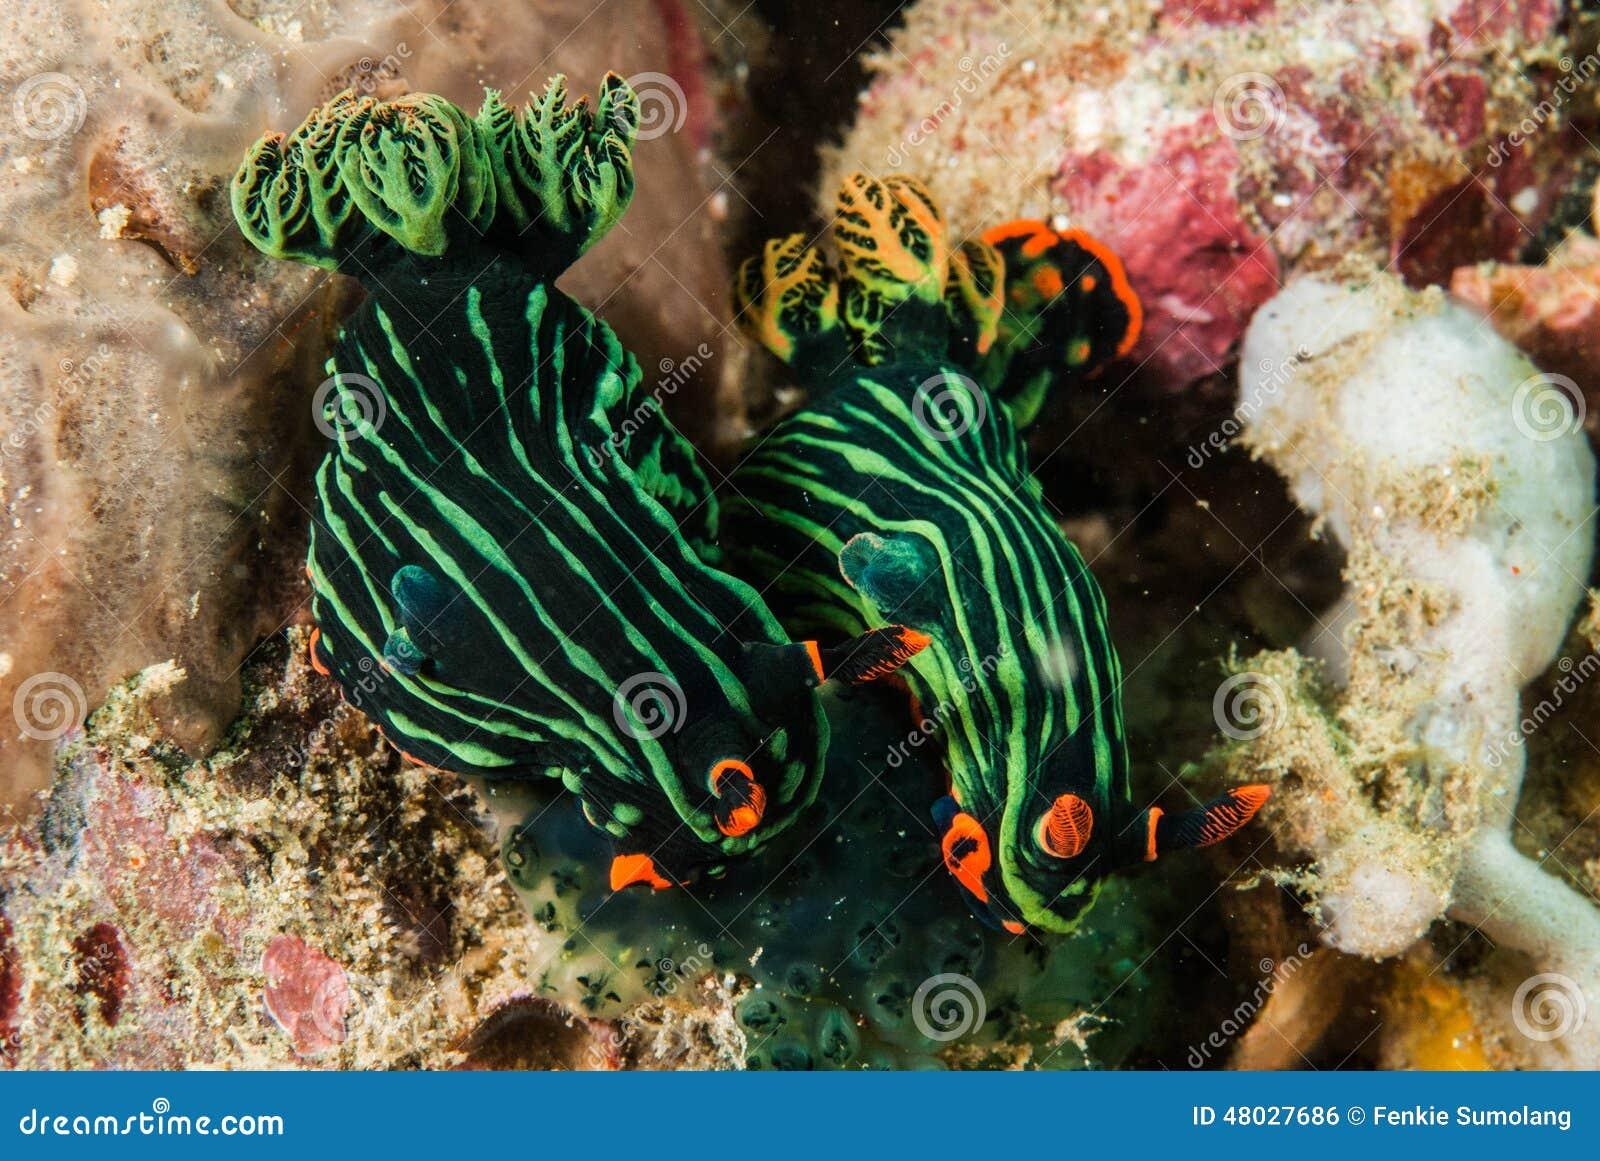 Two of nudibranch in Ambon, Maluku, Indonesia underwater photo